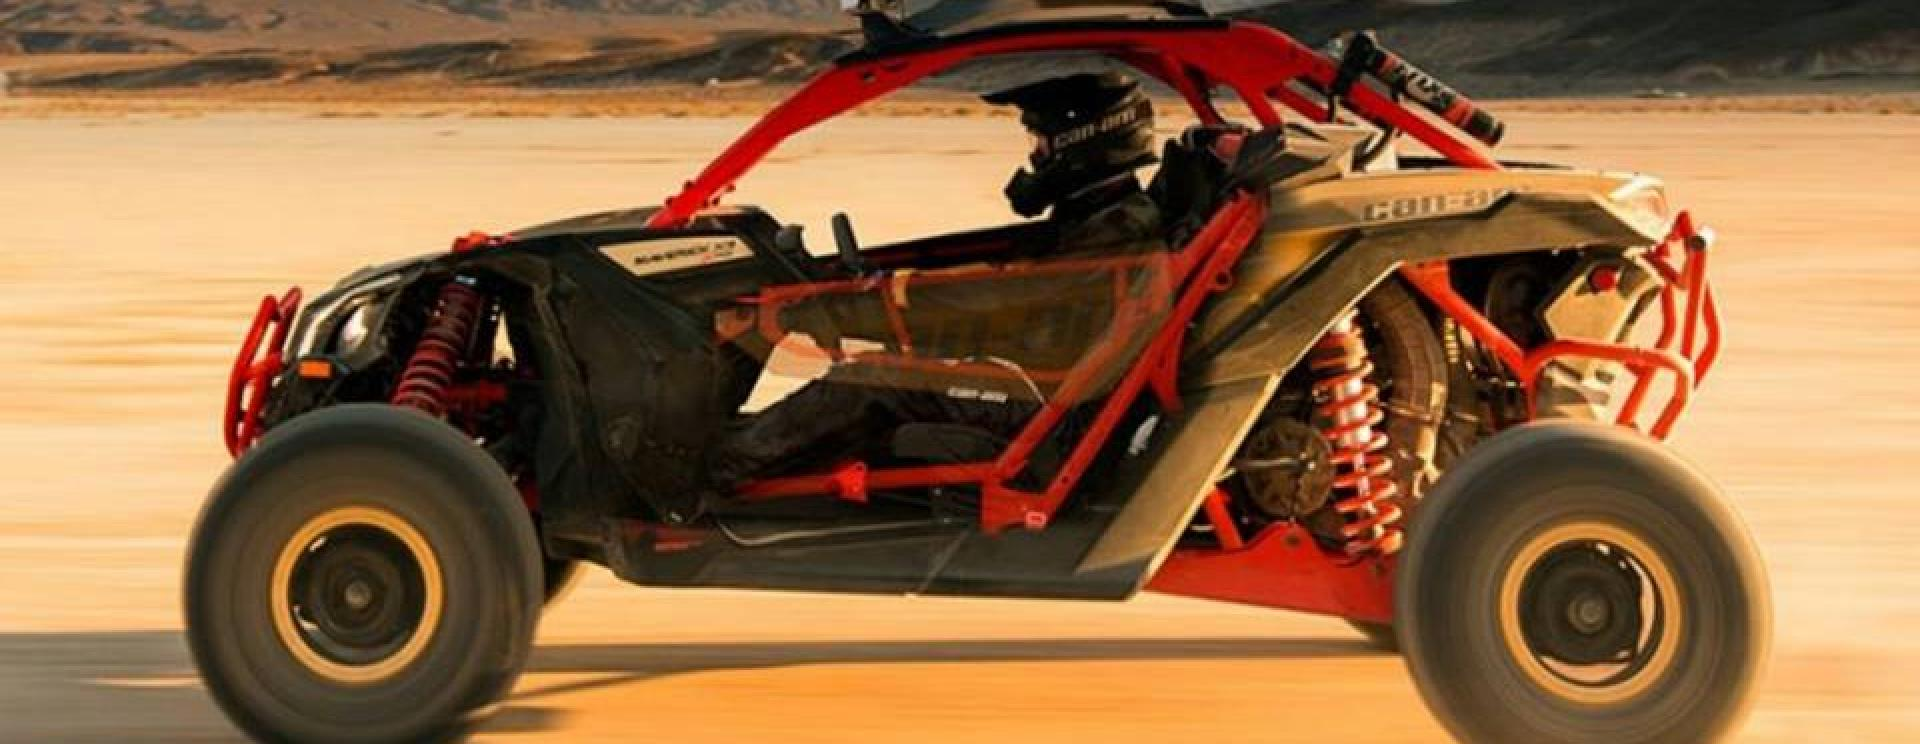 Rice's Rapid Motorsports